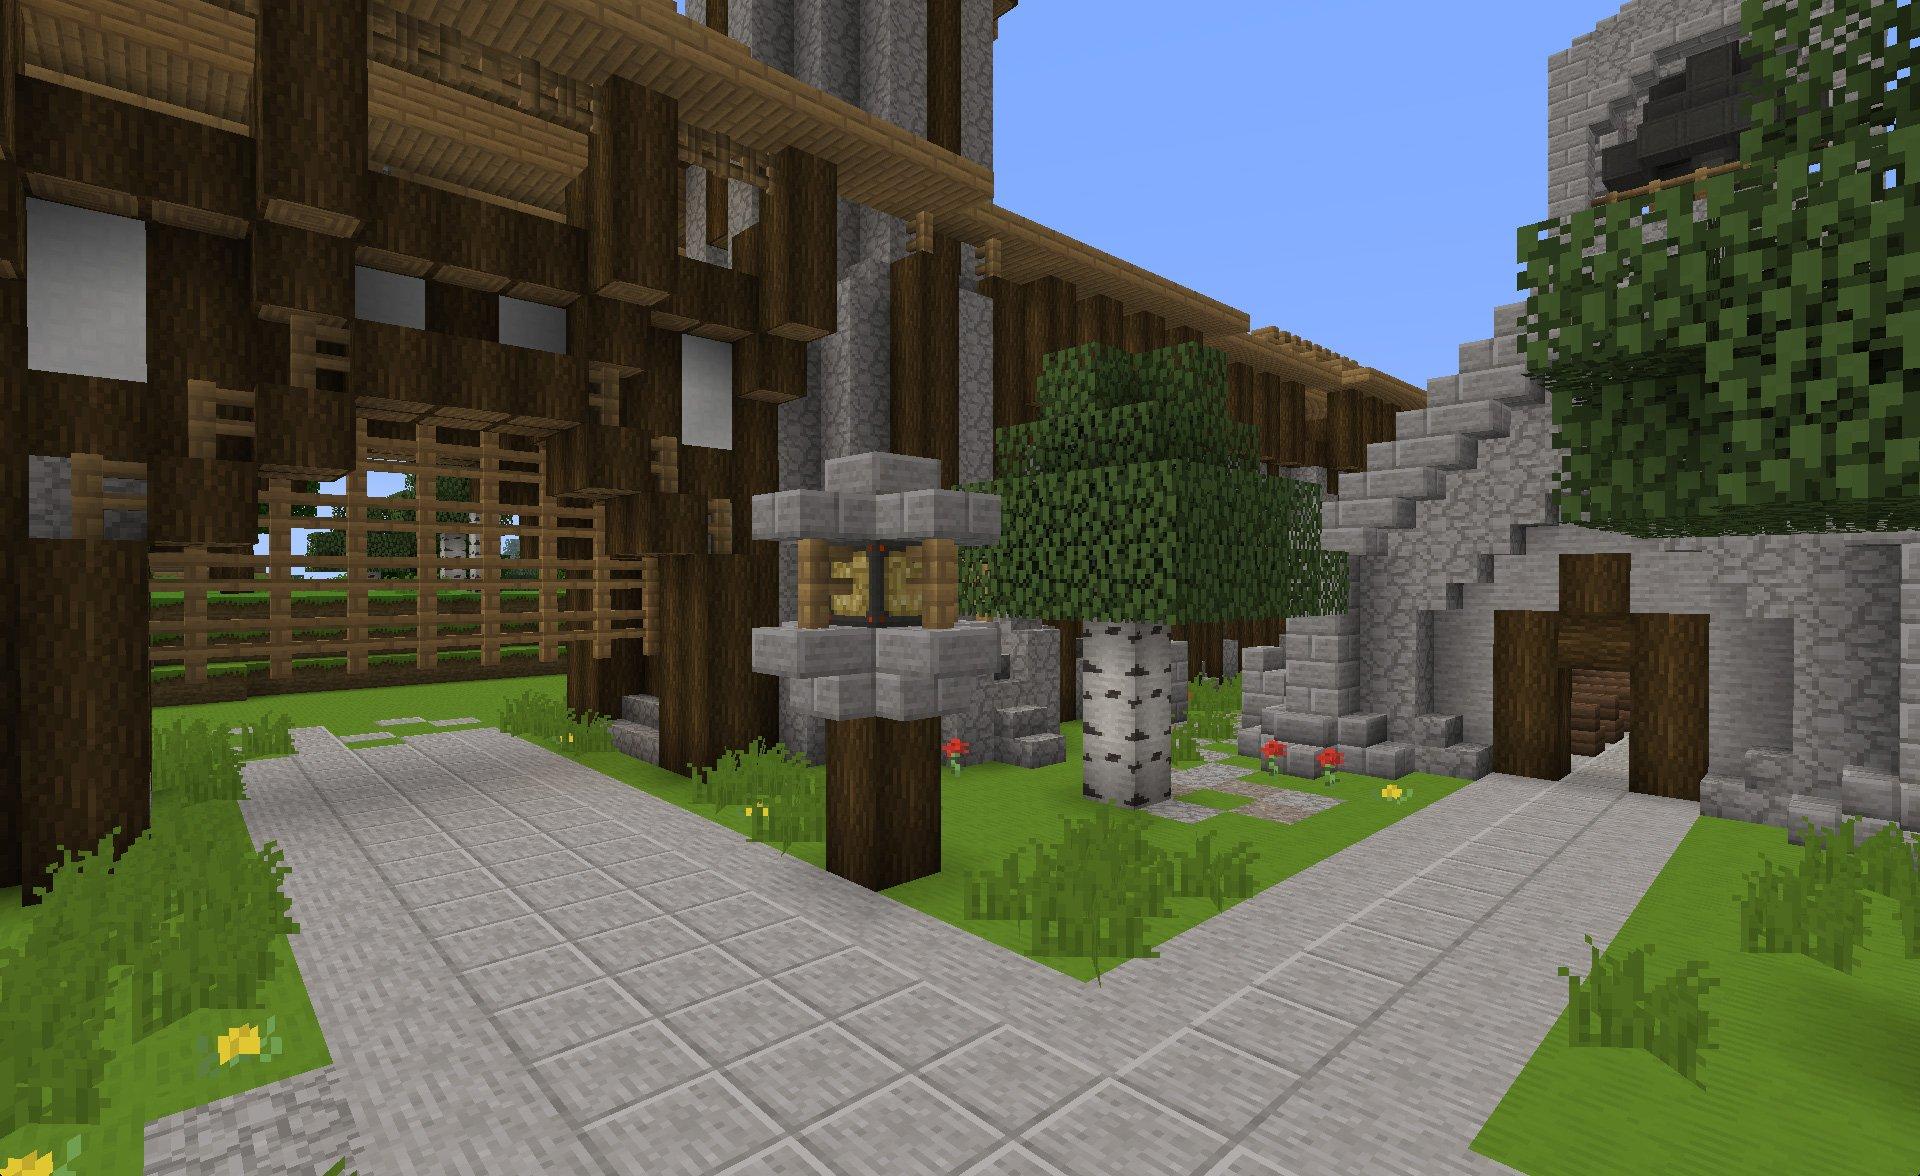 Xenocontendi | Minecraft Texture Packs